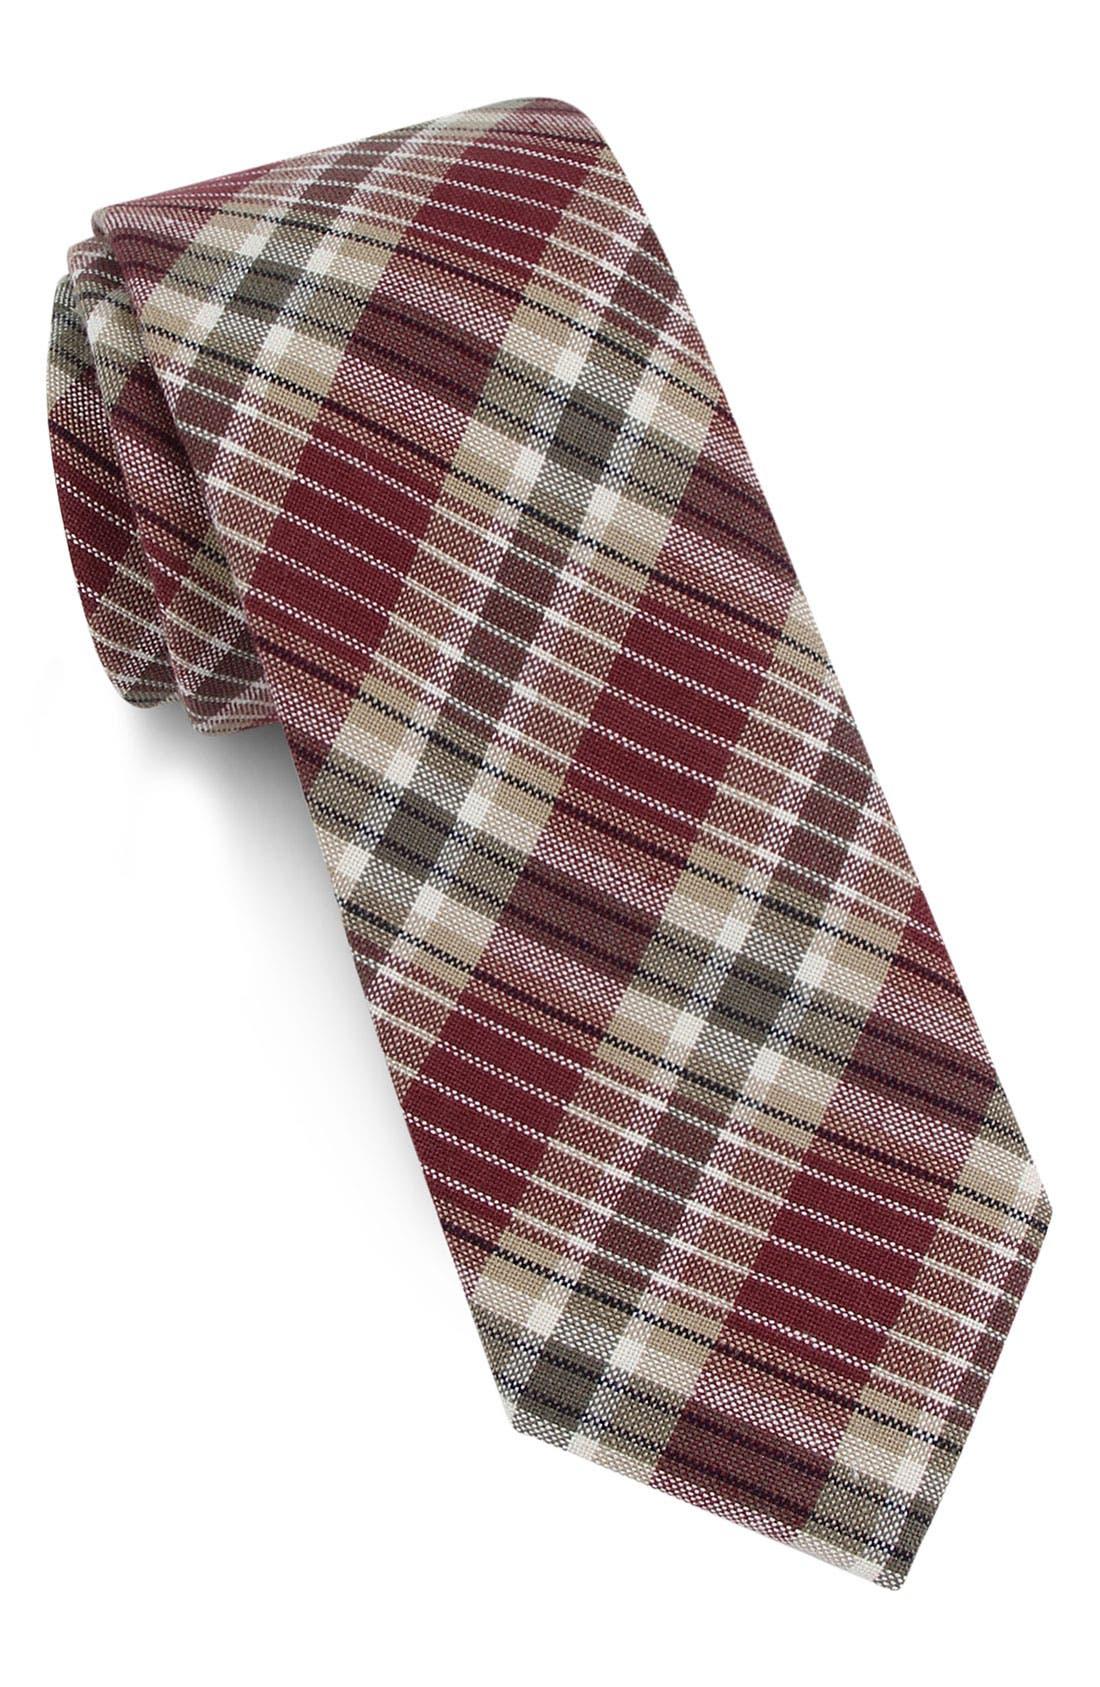 Alternate Image 1 Selected - 1901 Plaid Skinny Tie